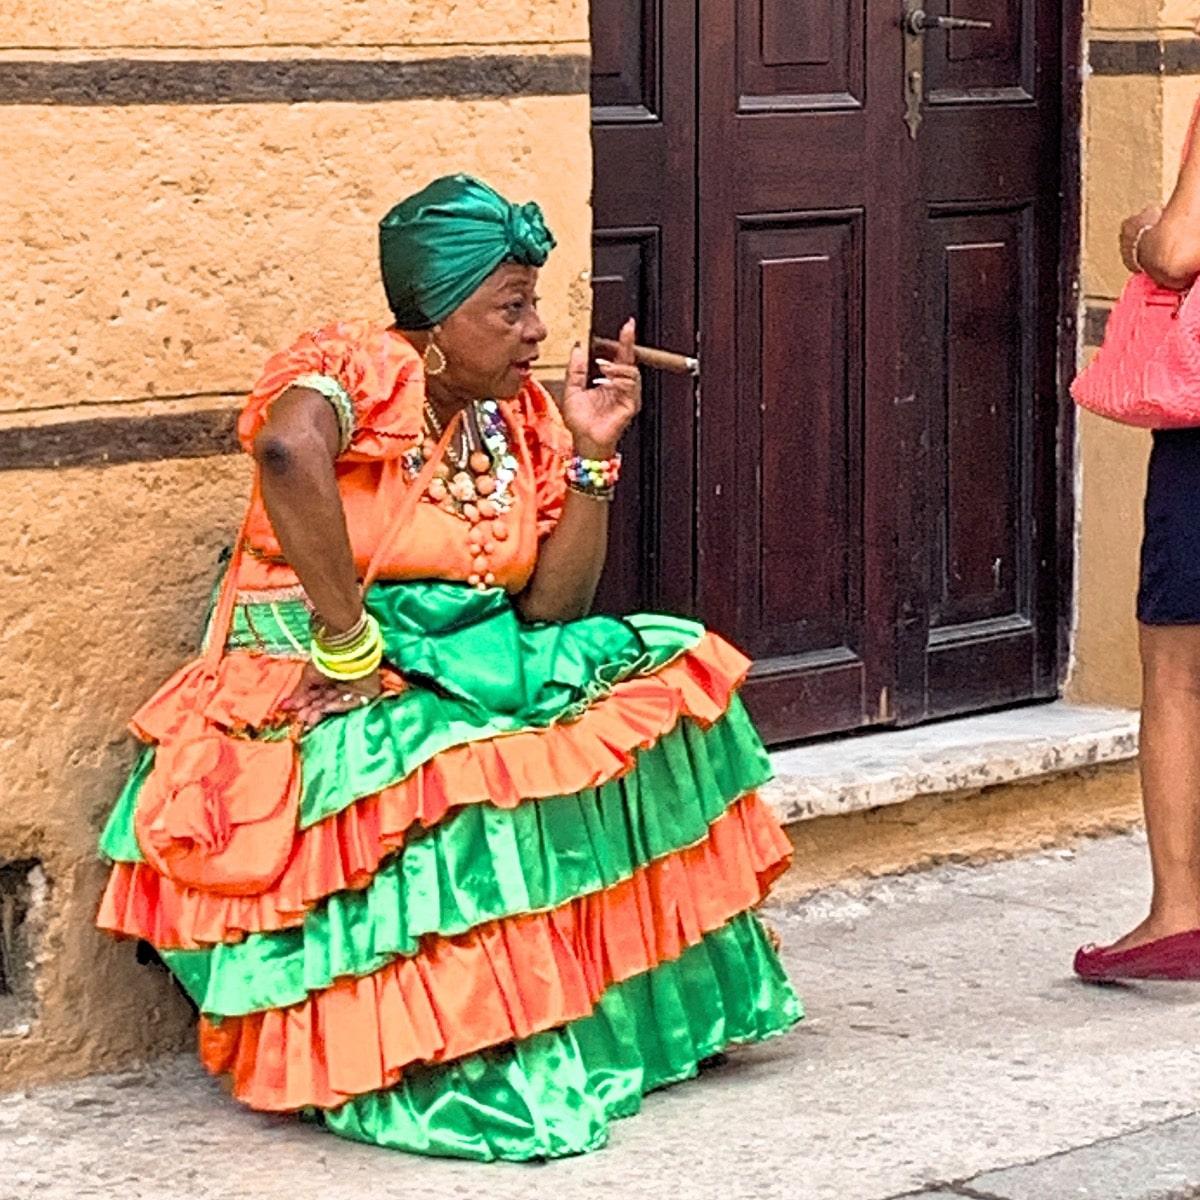 Cuba souvenirs 24